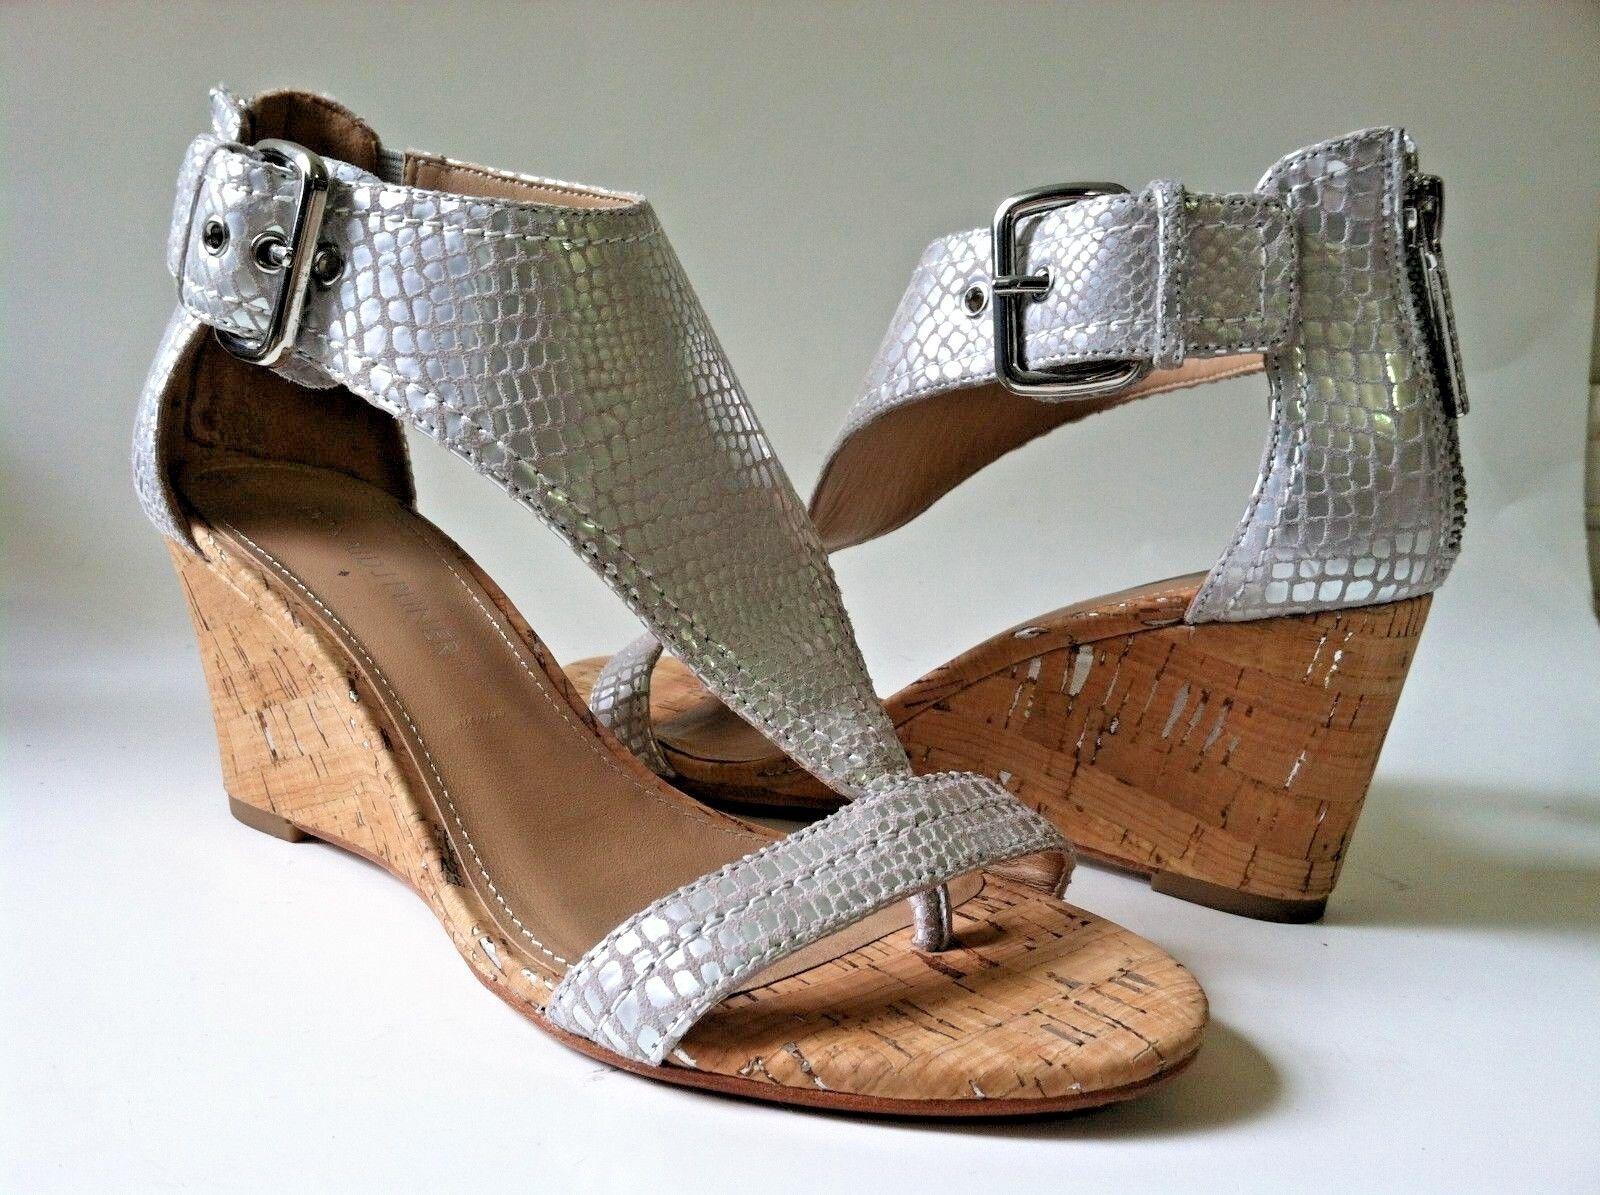 Donald Pliner femmes chaussures argent high heel cork wedge animal print ankle strap 6M